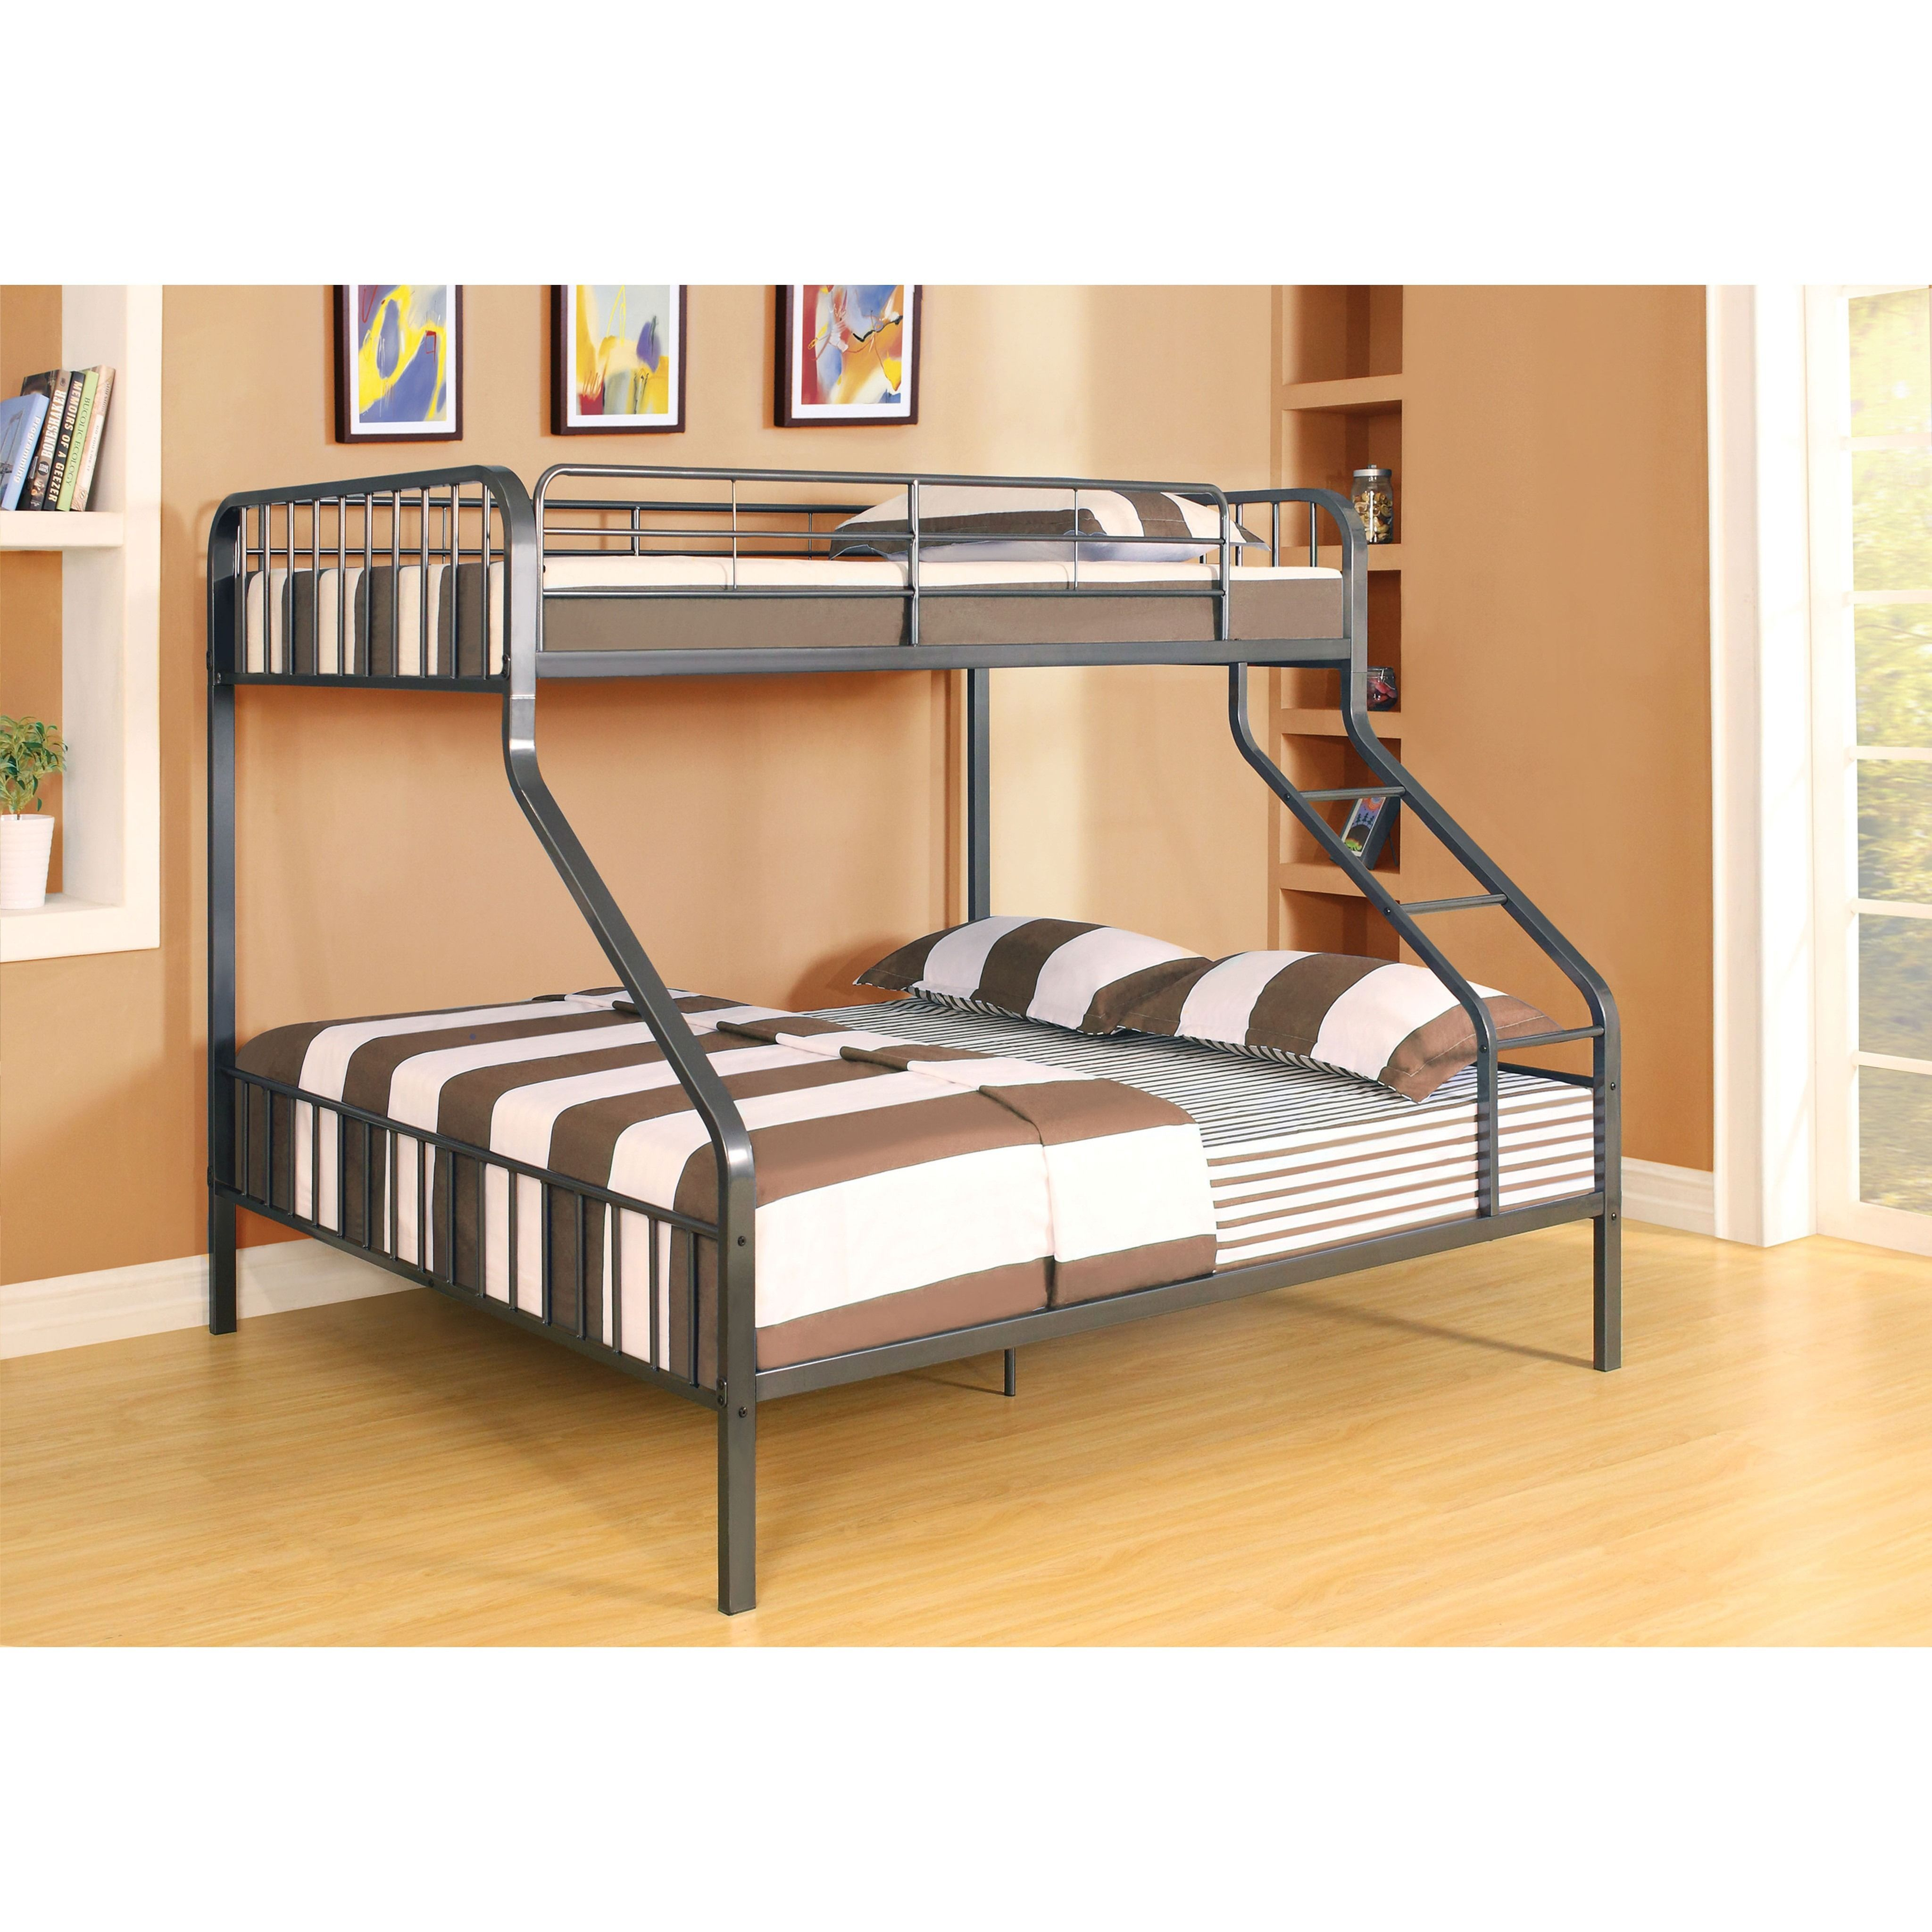 Caius Gunmetal Twin XL over Queen Bunk Bed